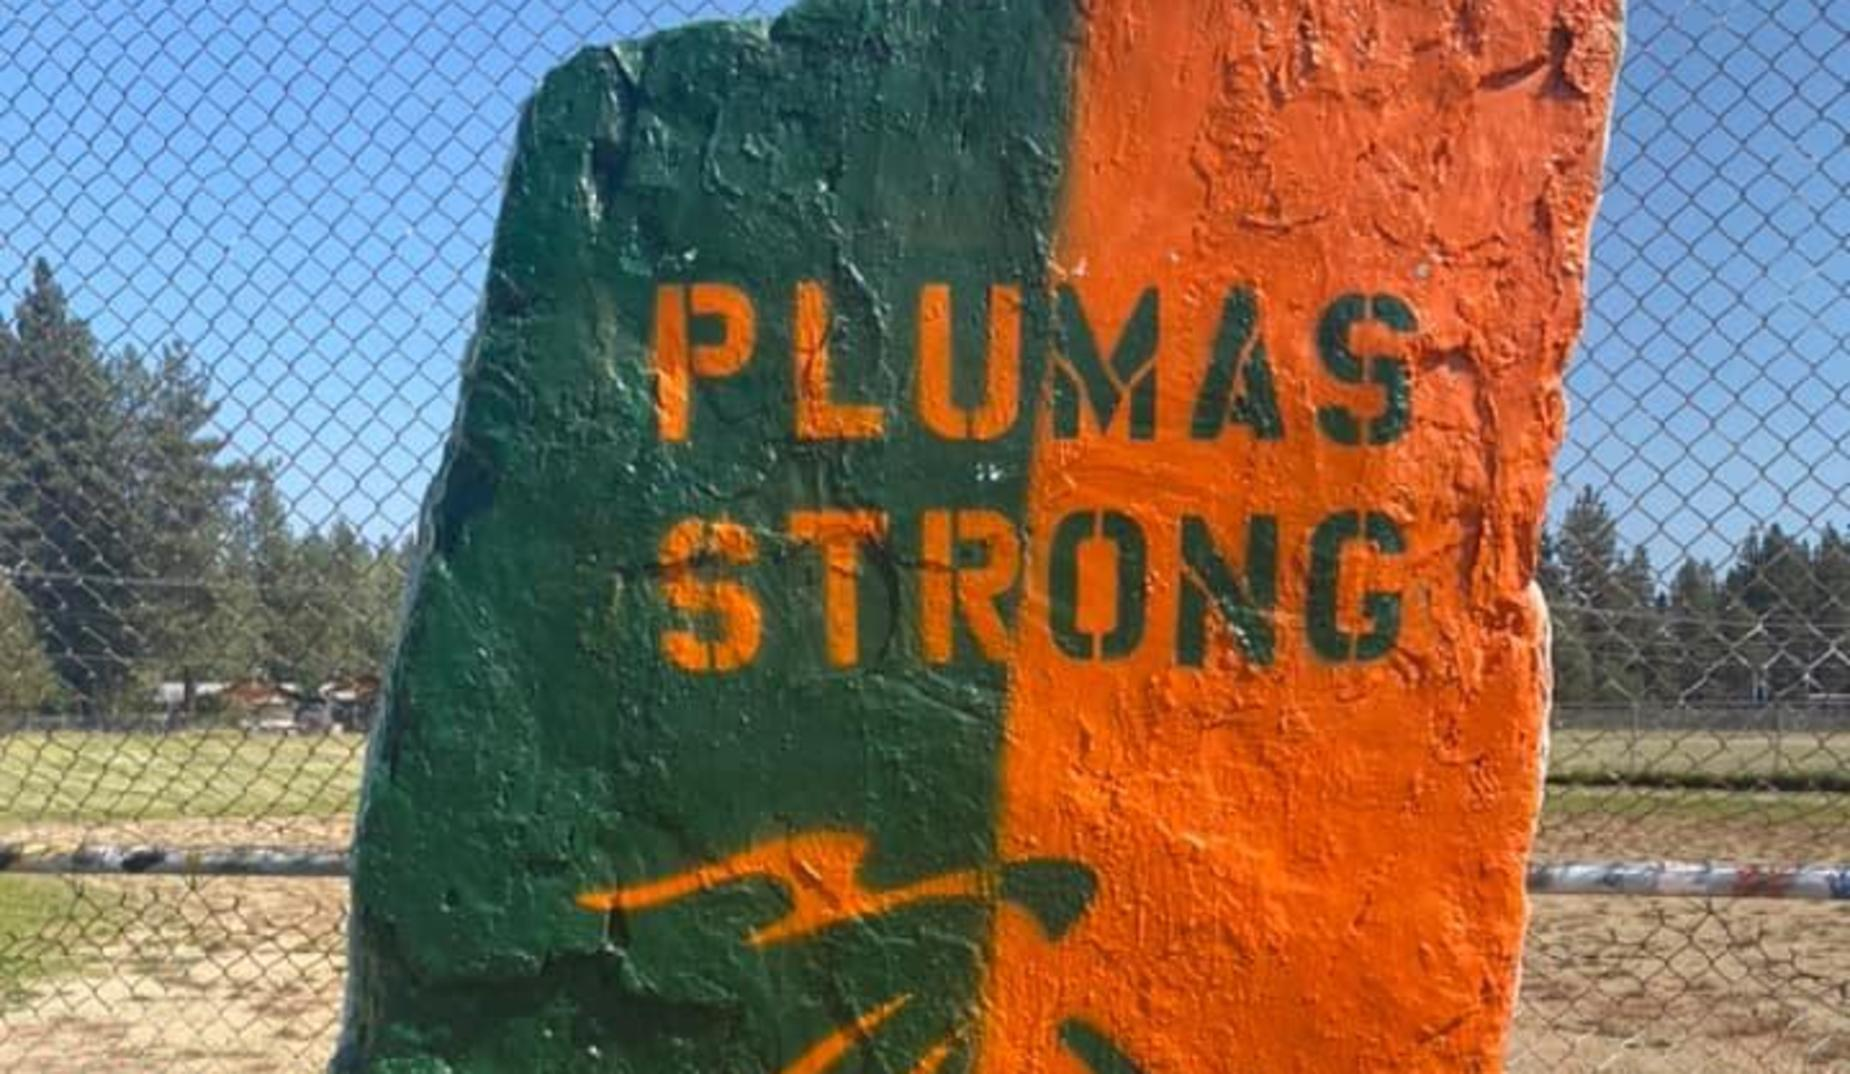 plumas strong at chester jr sr high school